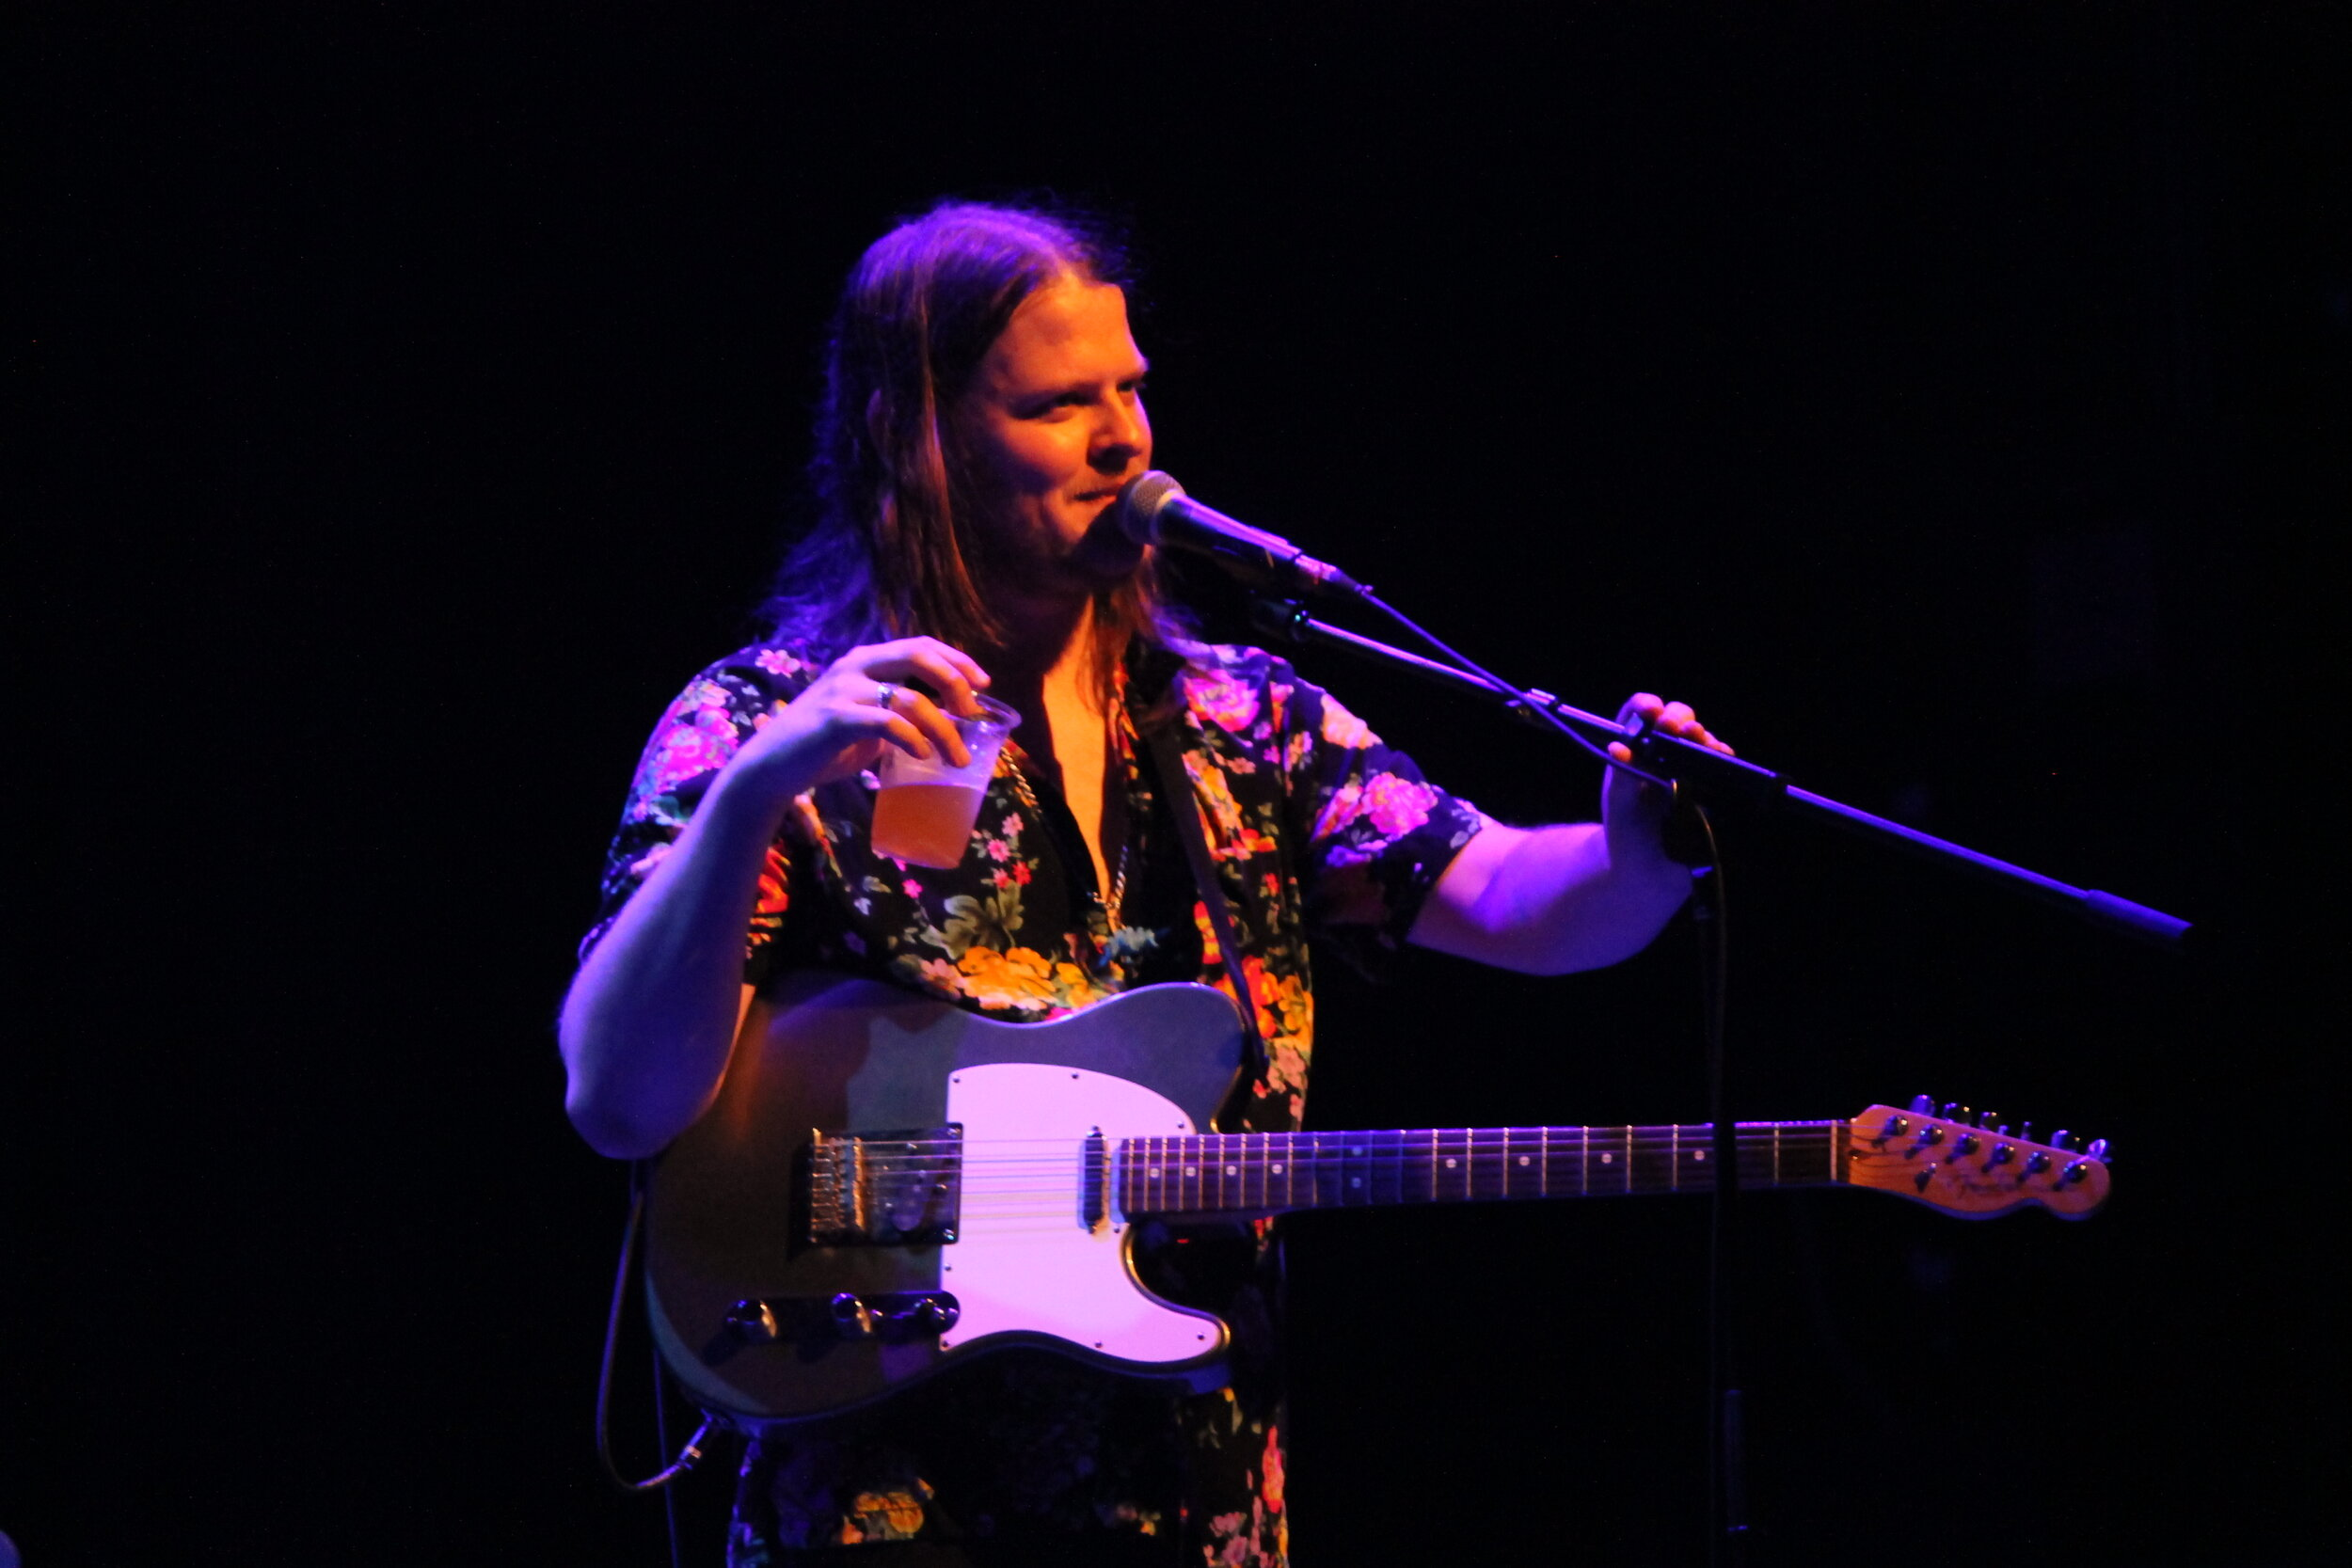 Dana T. at the Englert Theatre. Photo by Lauren Arzbaecher